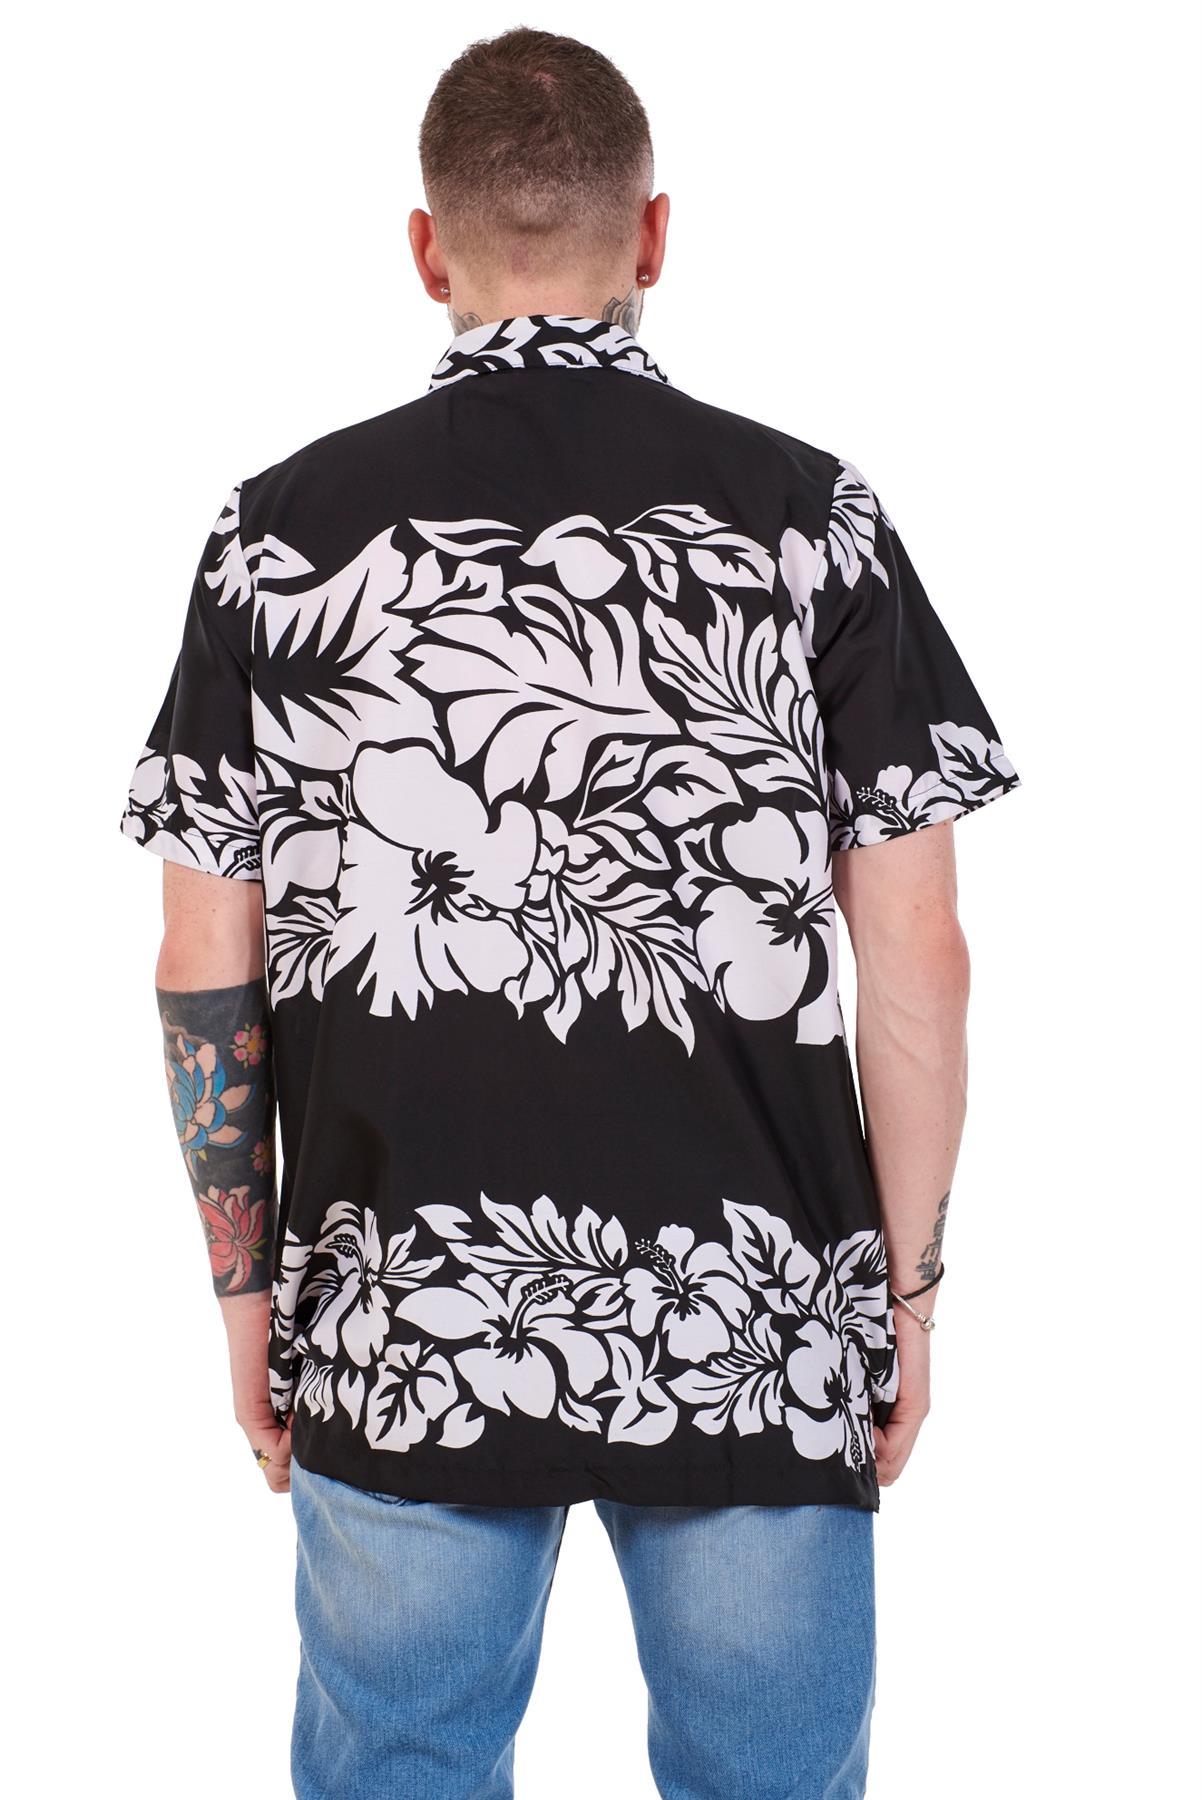 Mens-Hawaiian-Shirt-Multi-Colors-Print-Regular-Big-Size-Summer-Fancy-Dress-M-5XL thumbnail 5